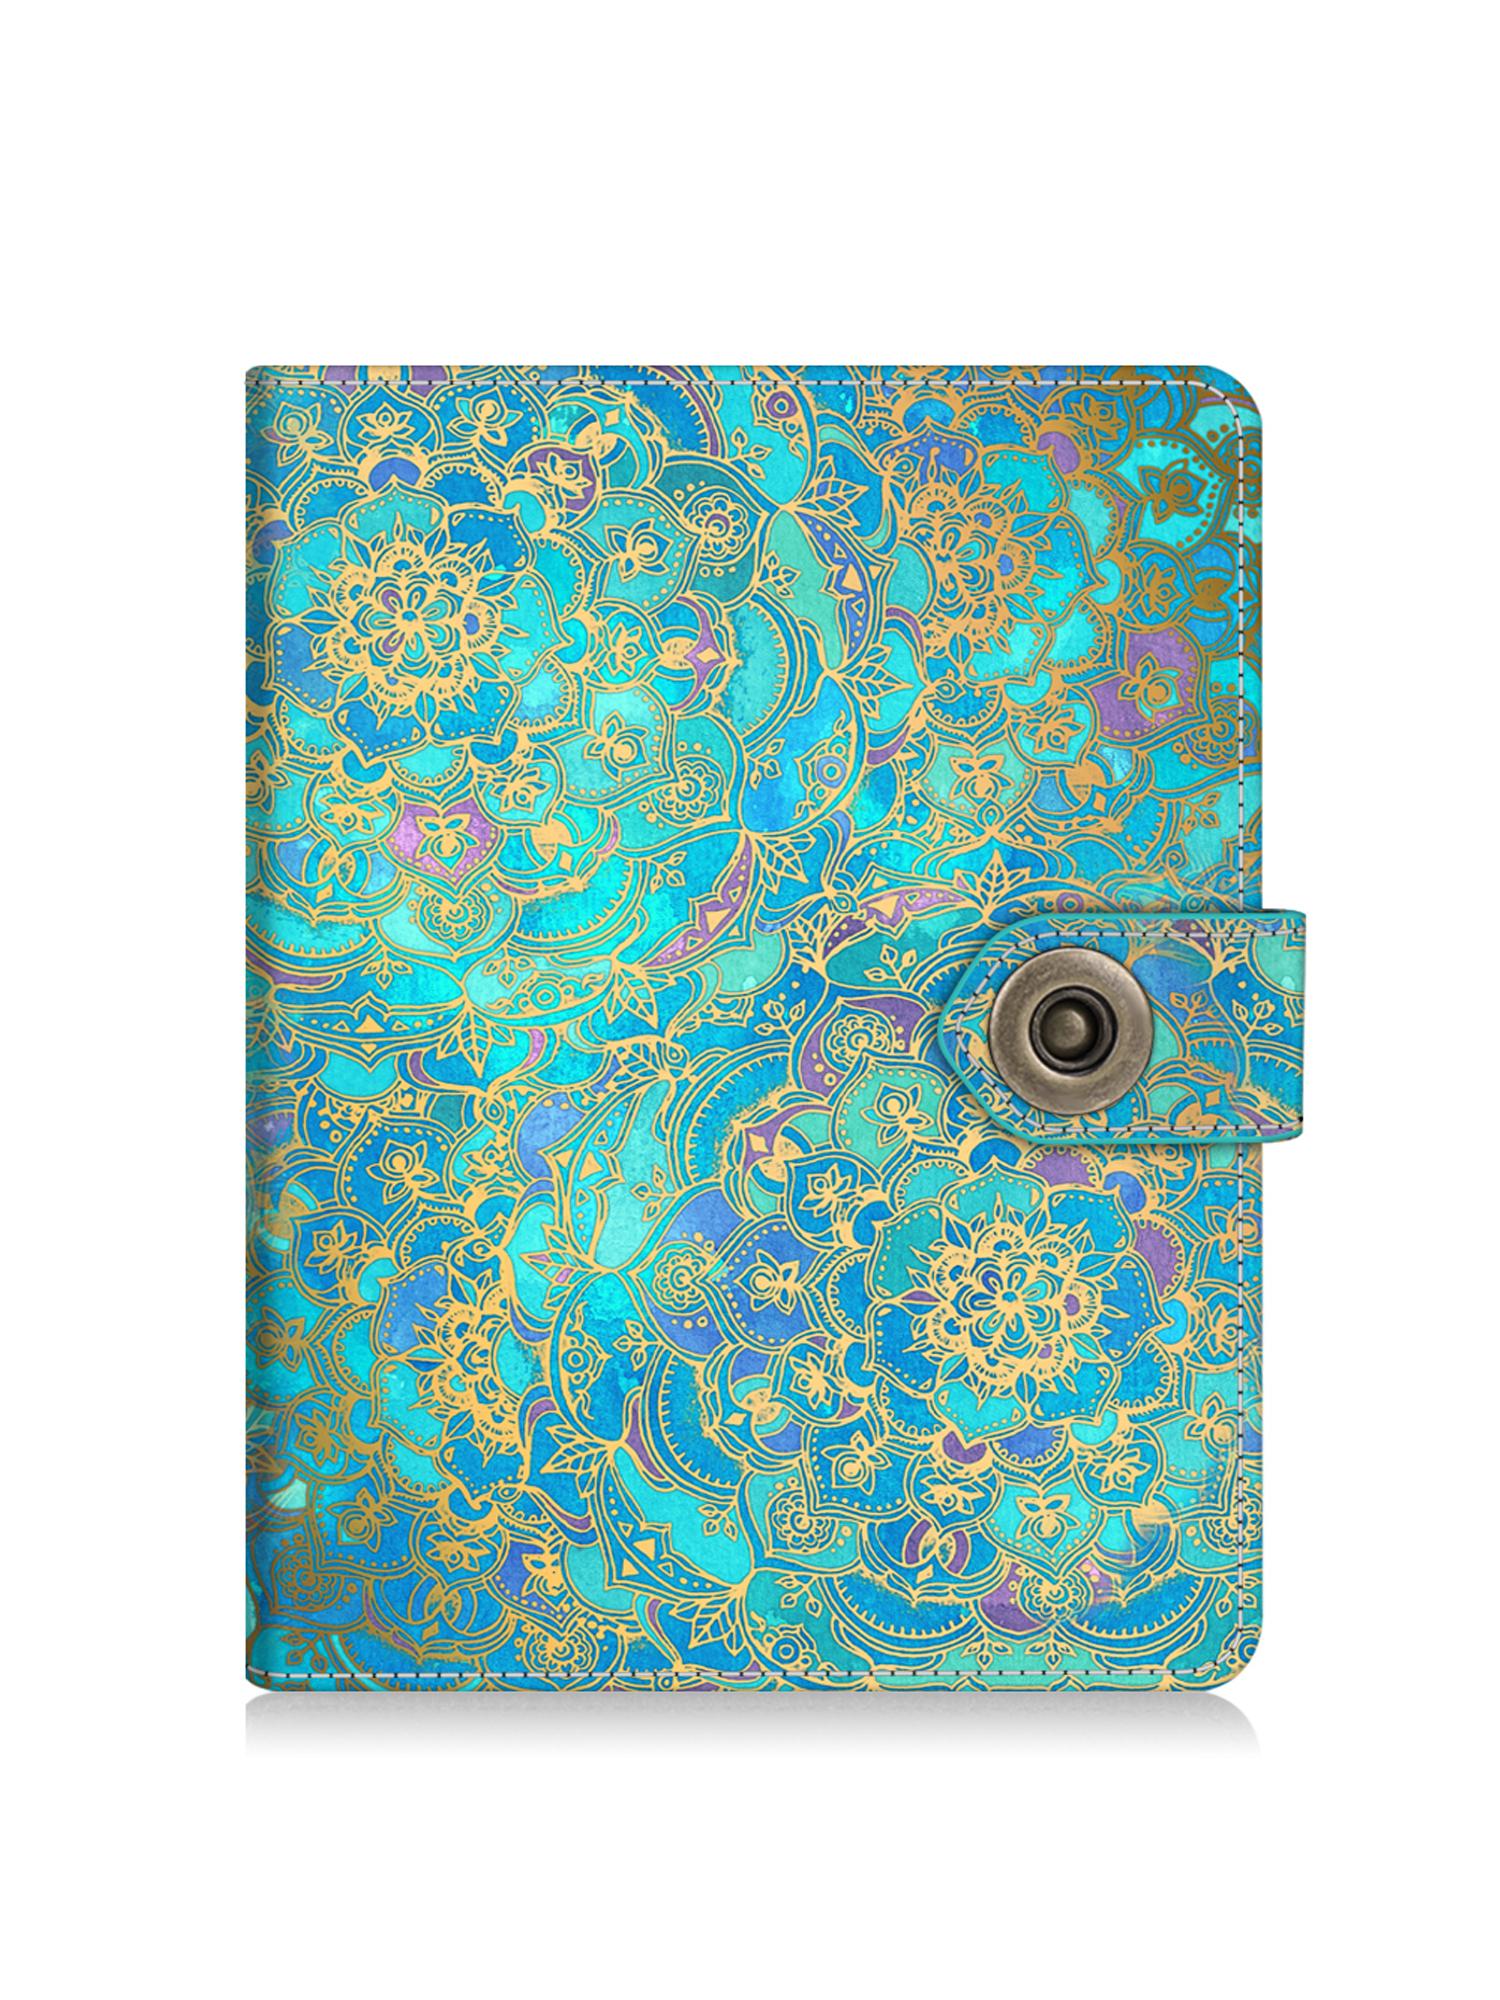 Fintie Passport Holder Travel Wallet Case - Premium Vegan Leather RFID Blocking Cover with Snap Closure, Shade of Blue